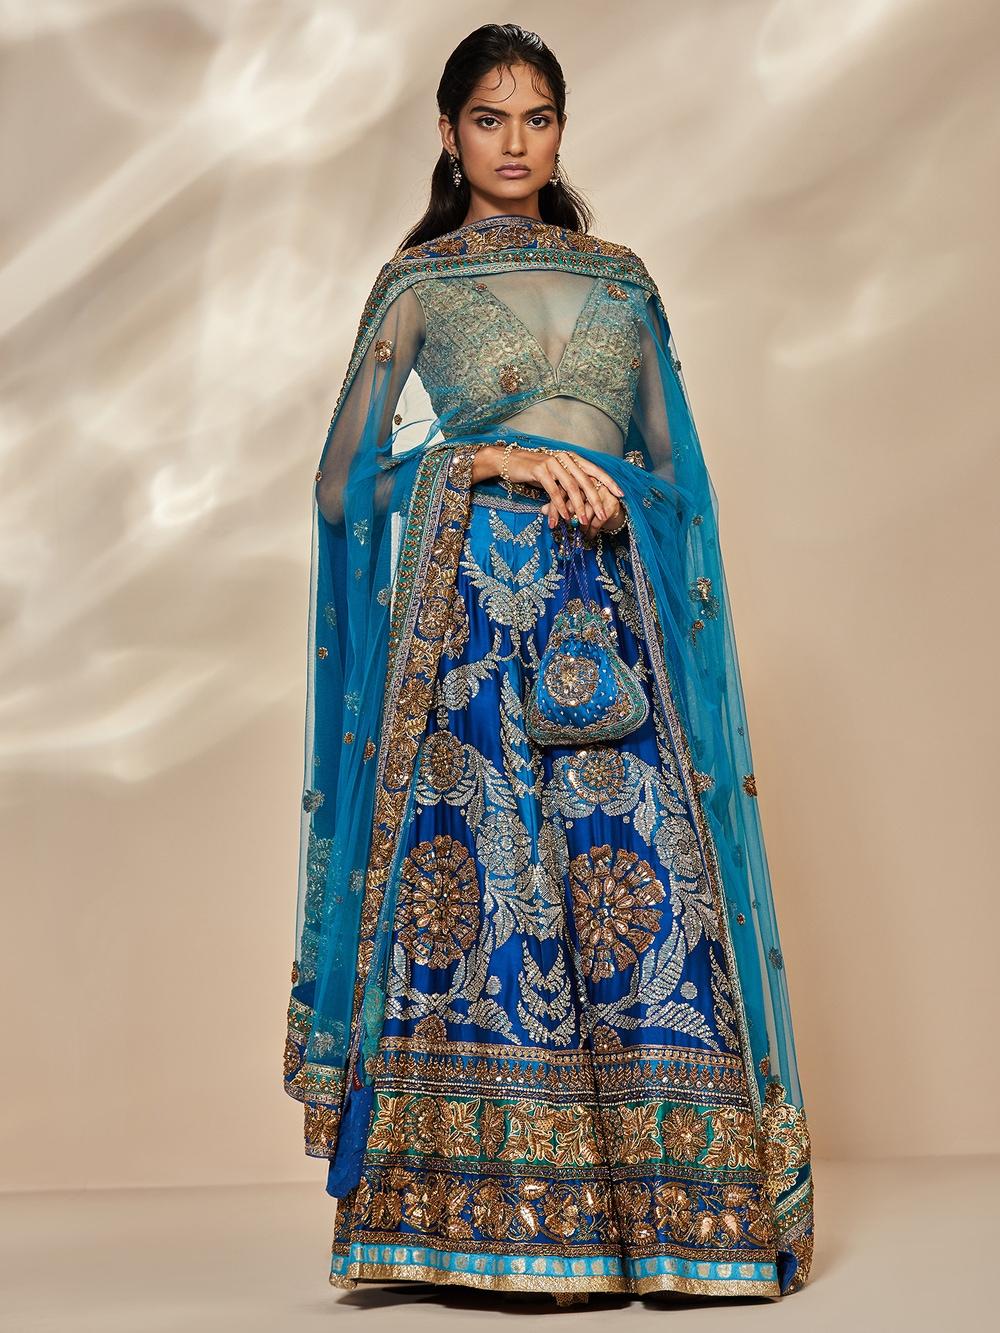 Royal Blue & Turquoise Saflower Embroidered Lehenga With Dupatta